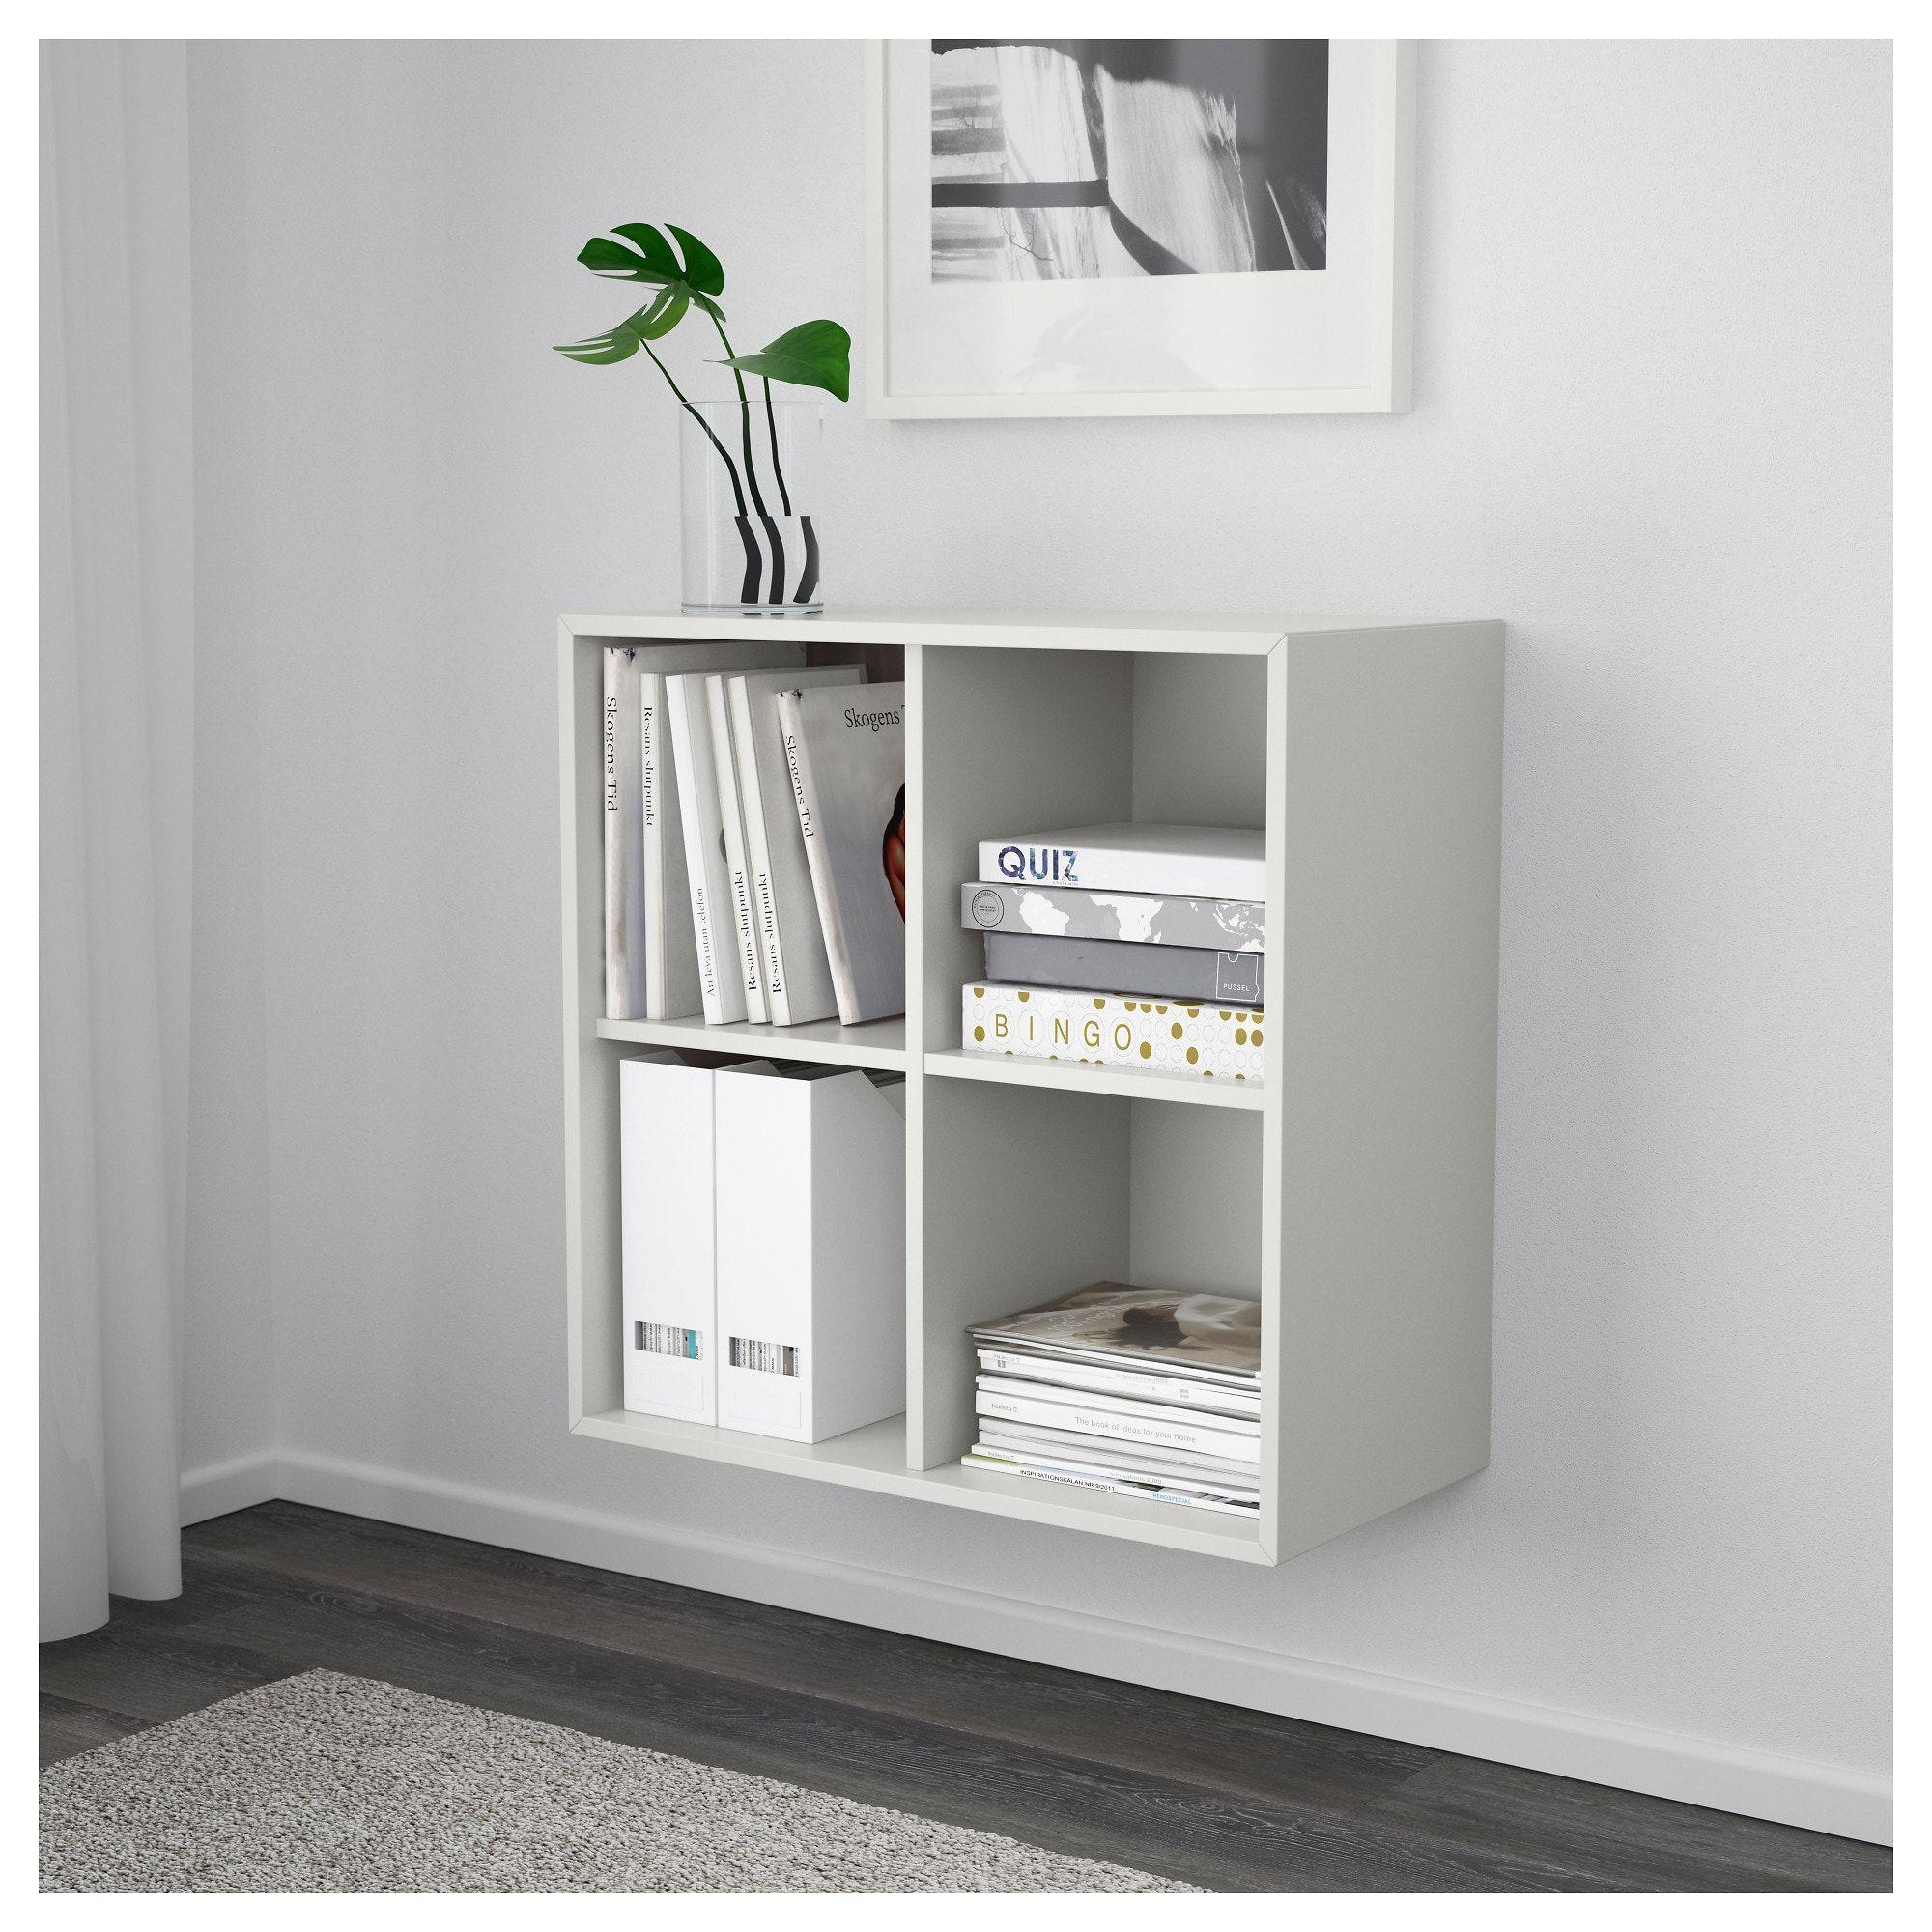 Eket Wall Mounted Shelf Unit Light Gray Ikea